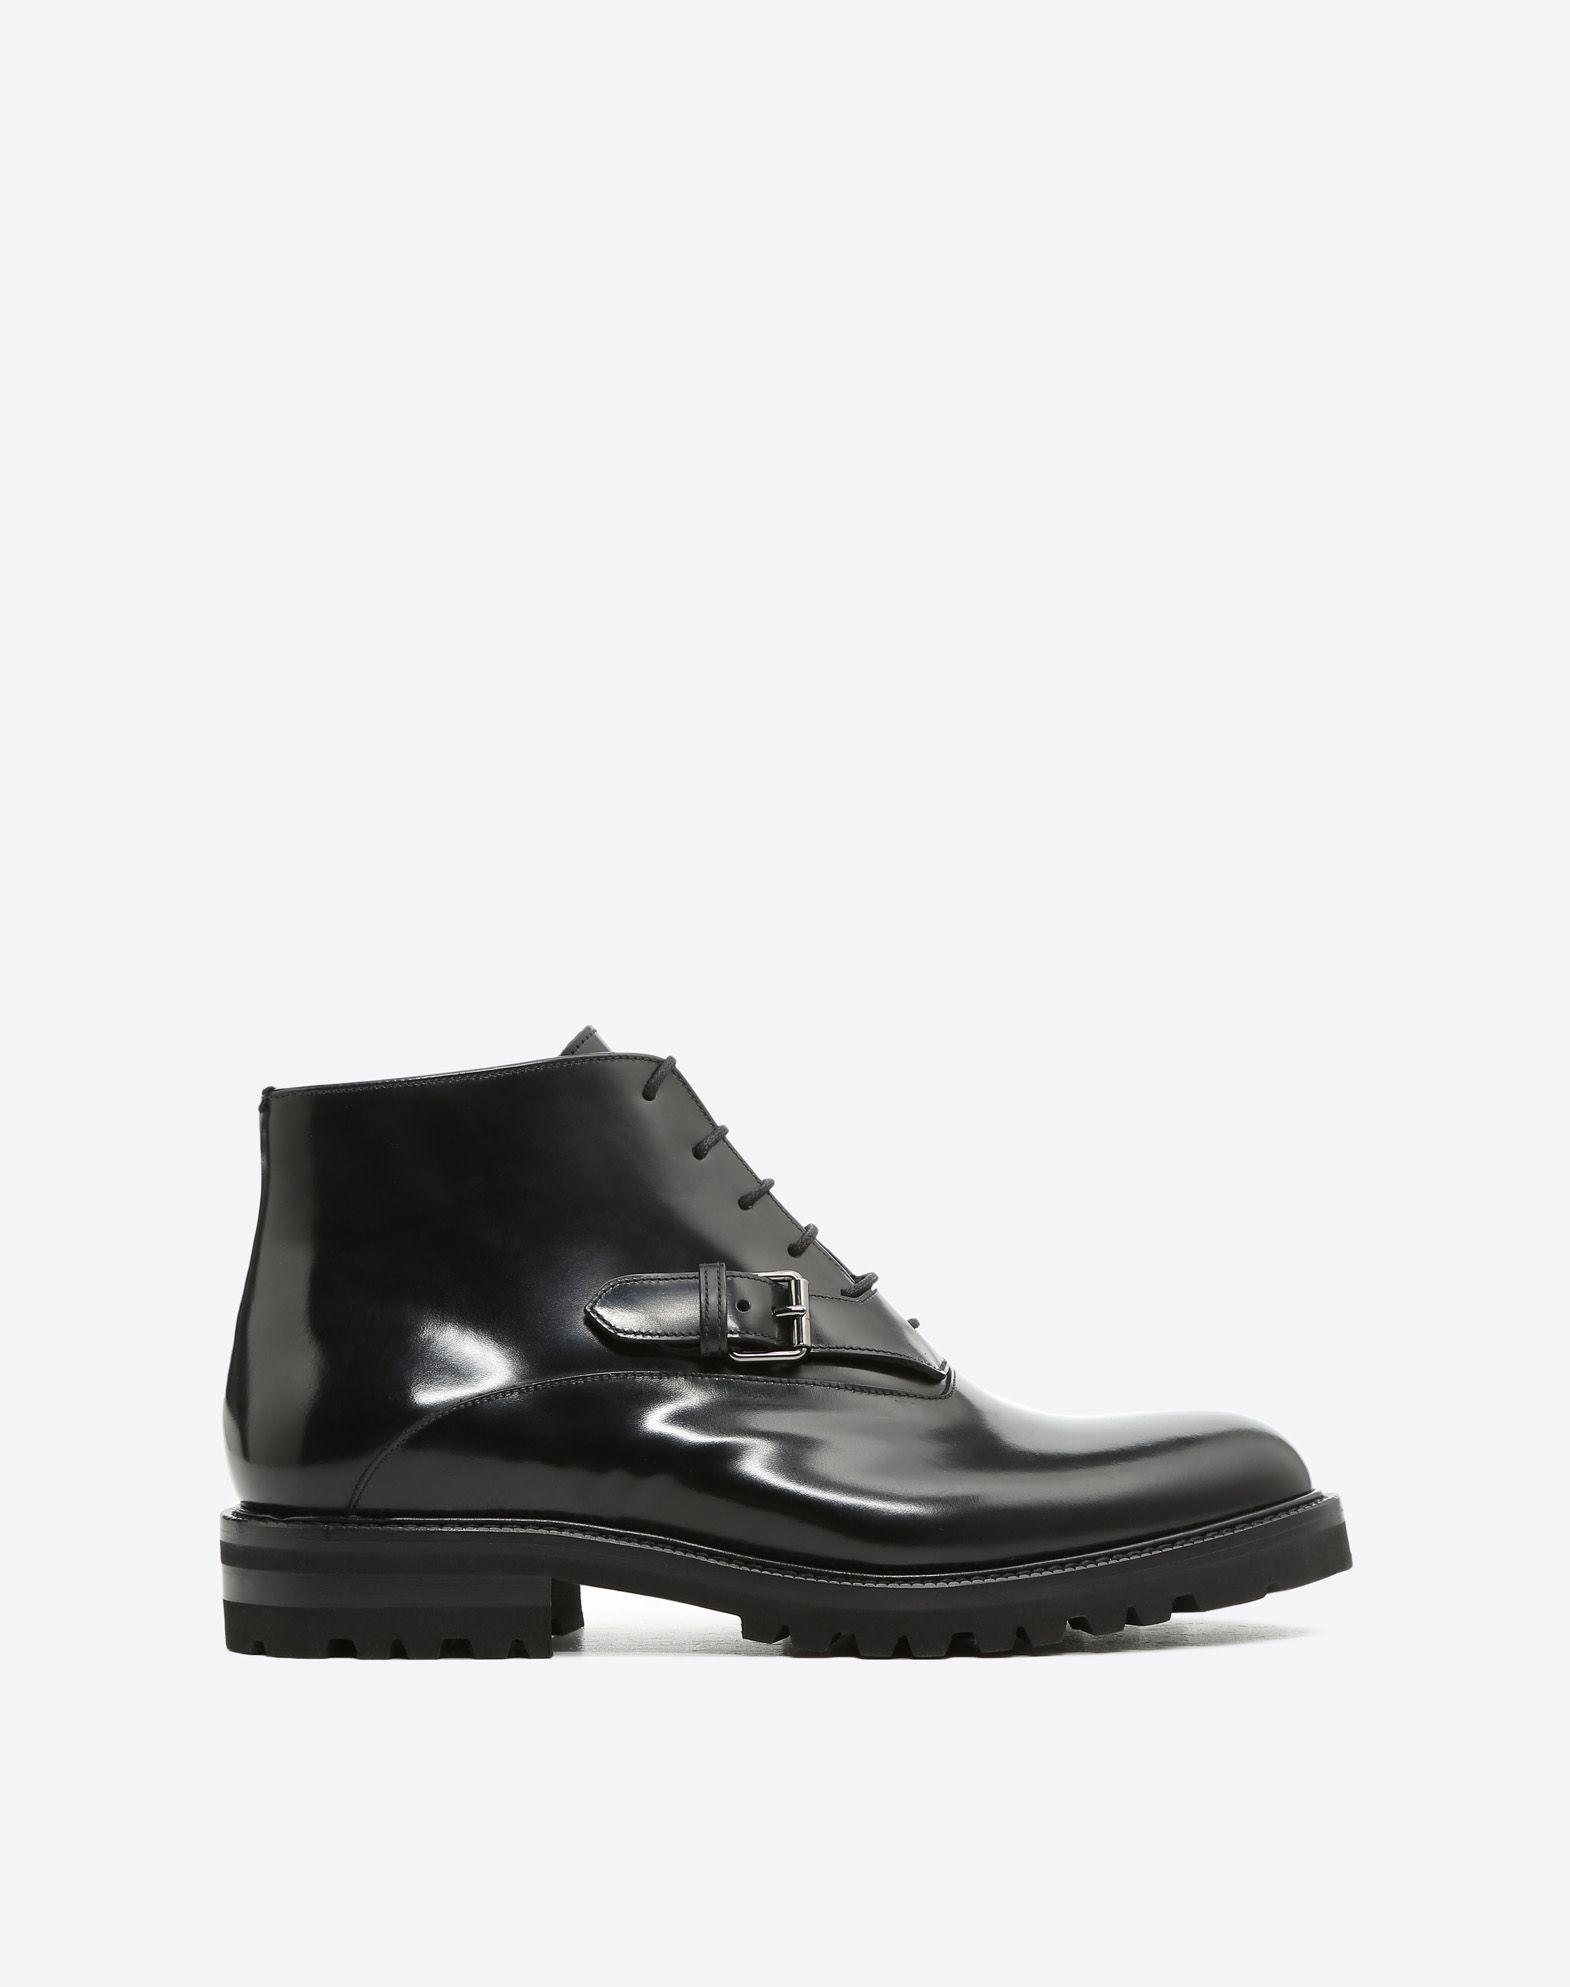 VALENTINO 圆头鞋头 系带 真皮衬里 粗糙鞋底  方型鞋跟 腰带扣 抛光皮 单色  45392465vi